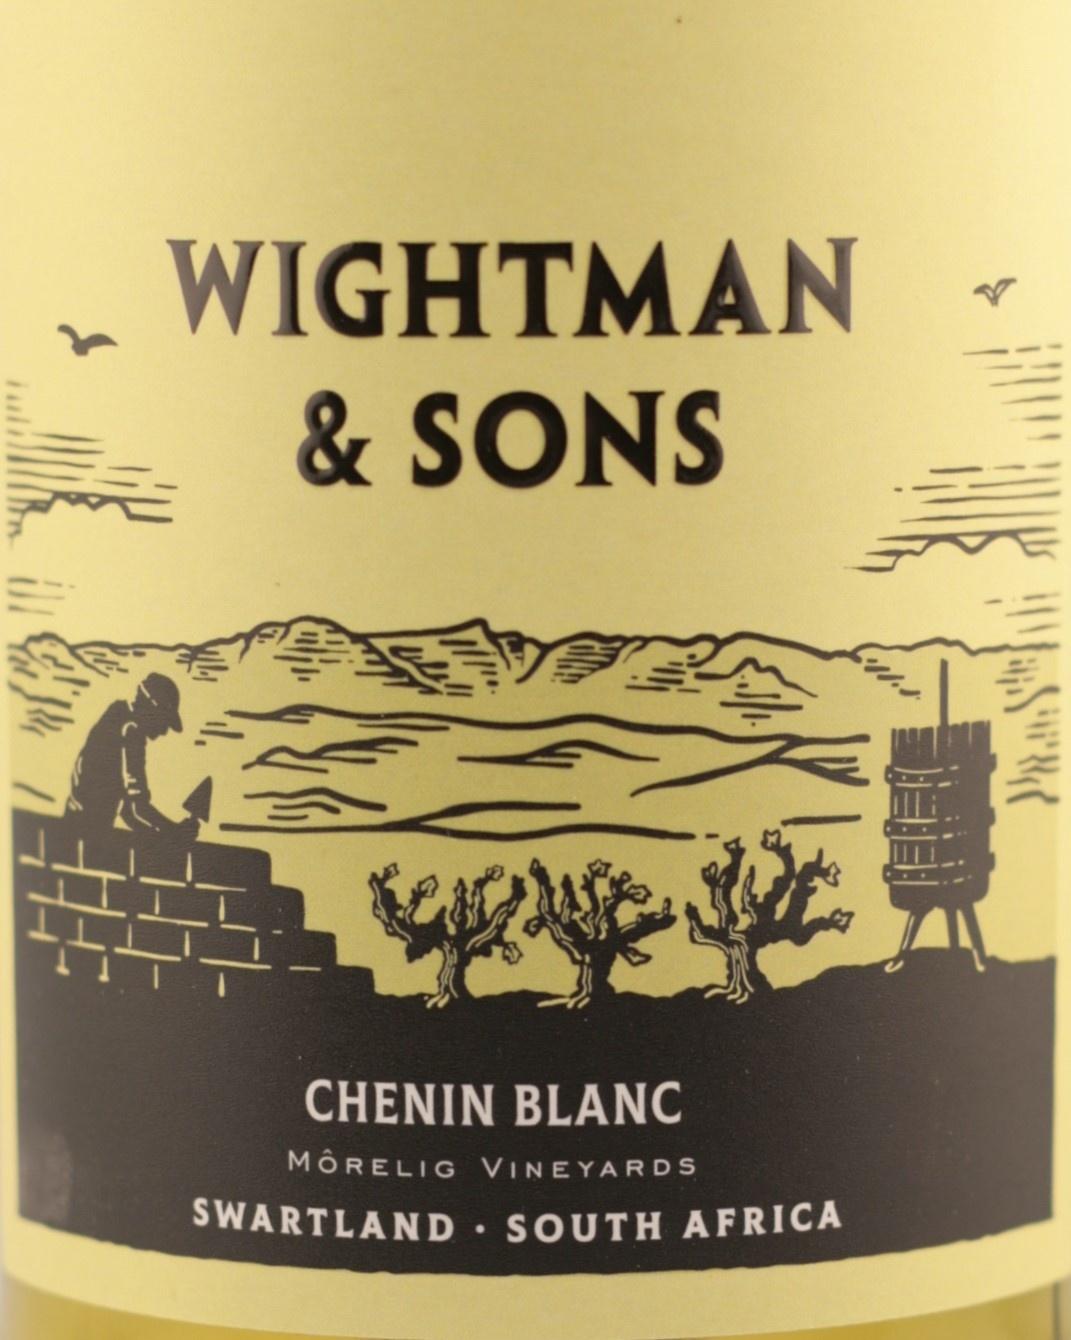 Chenin Blanc | Wightman & Sons | 2018 |  Morelig Vineyards | Swartland- Zuid Afrika |Chenin Blanc